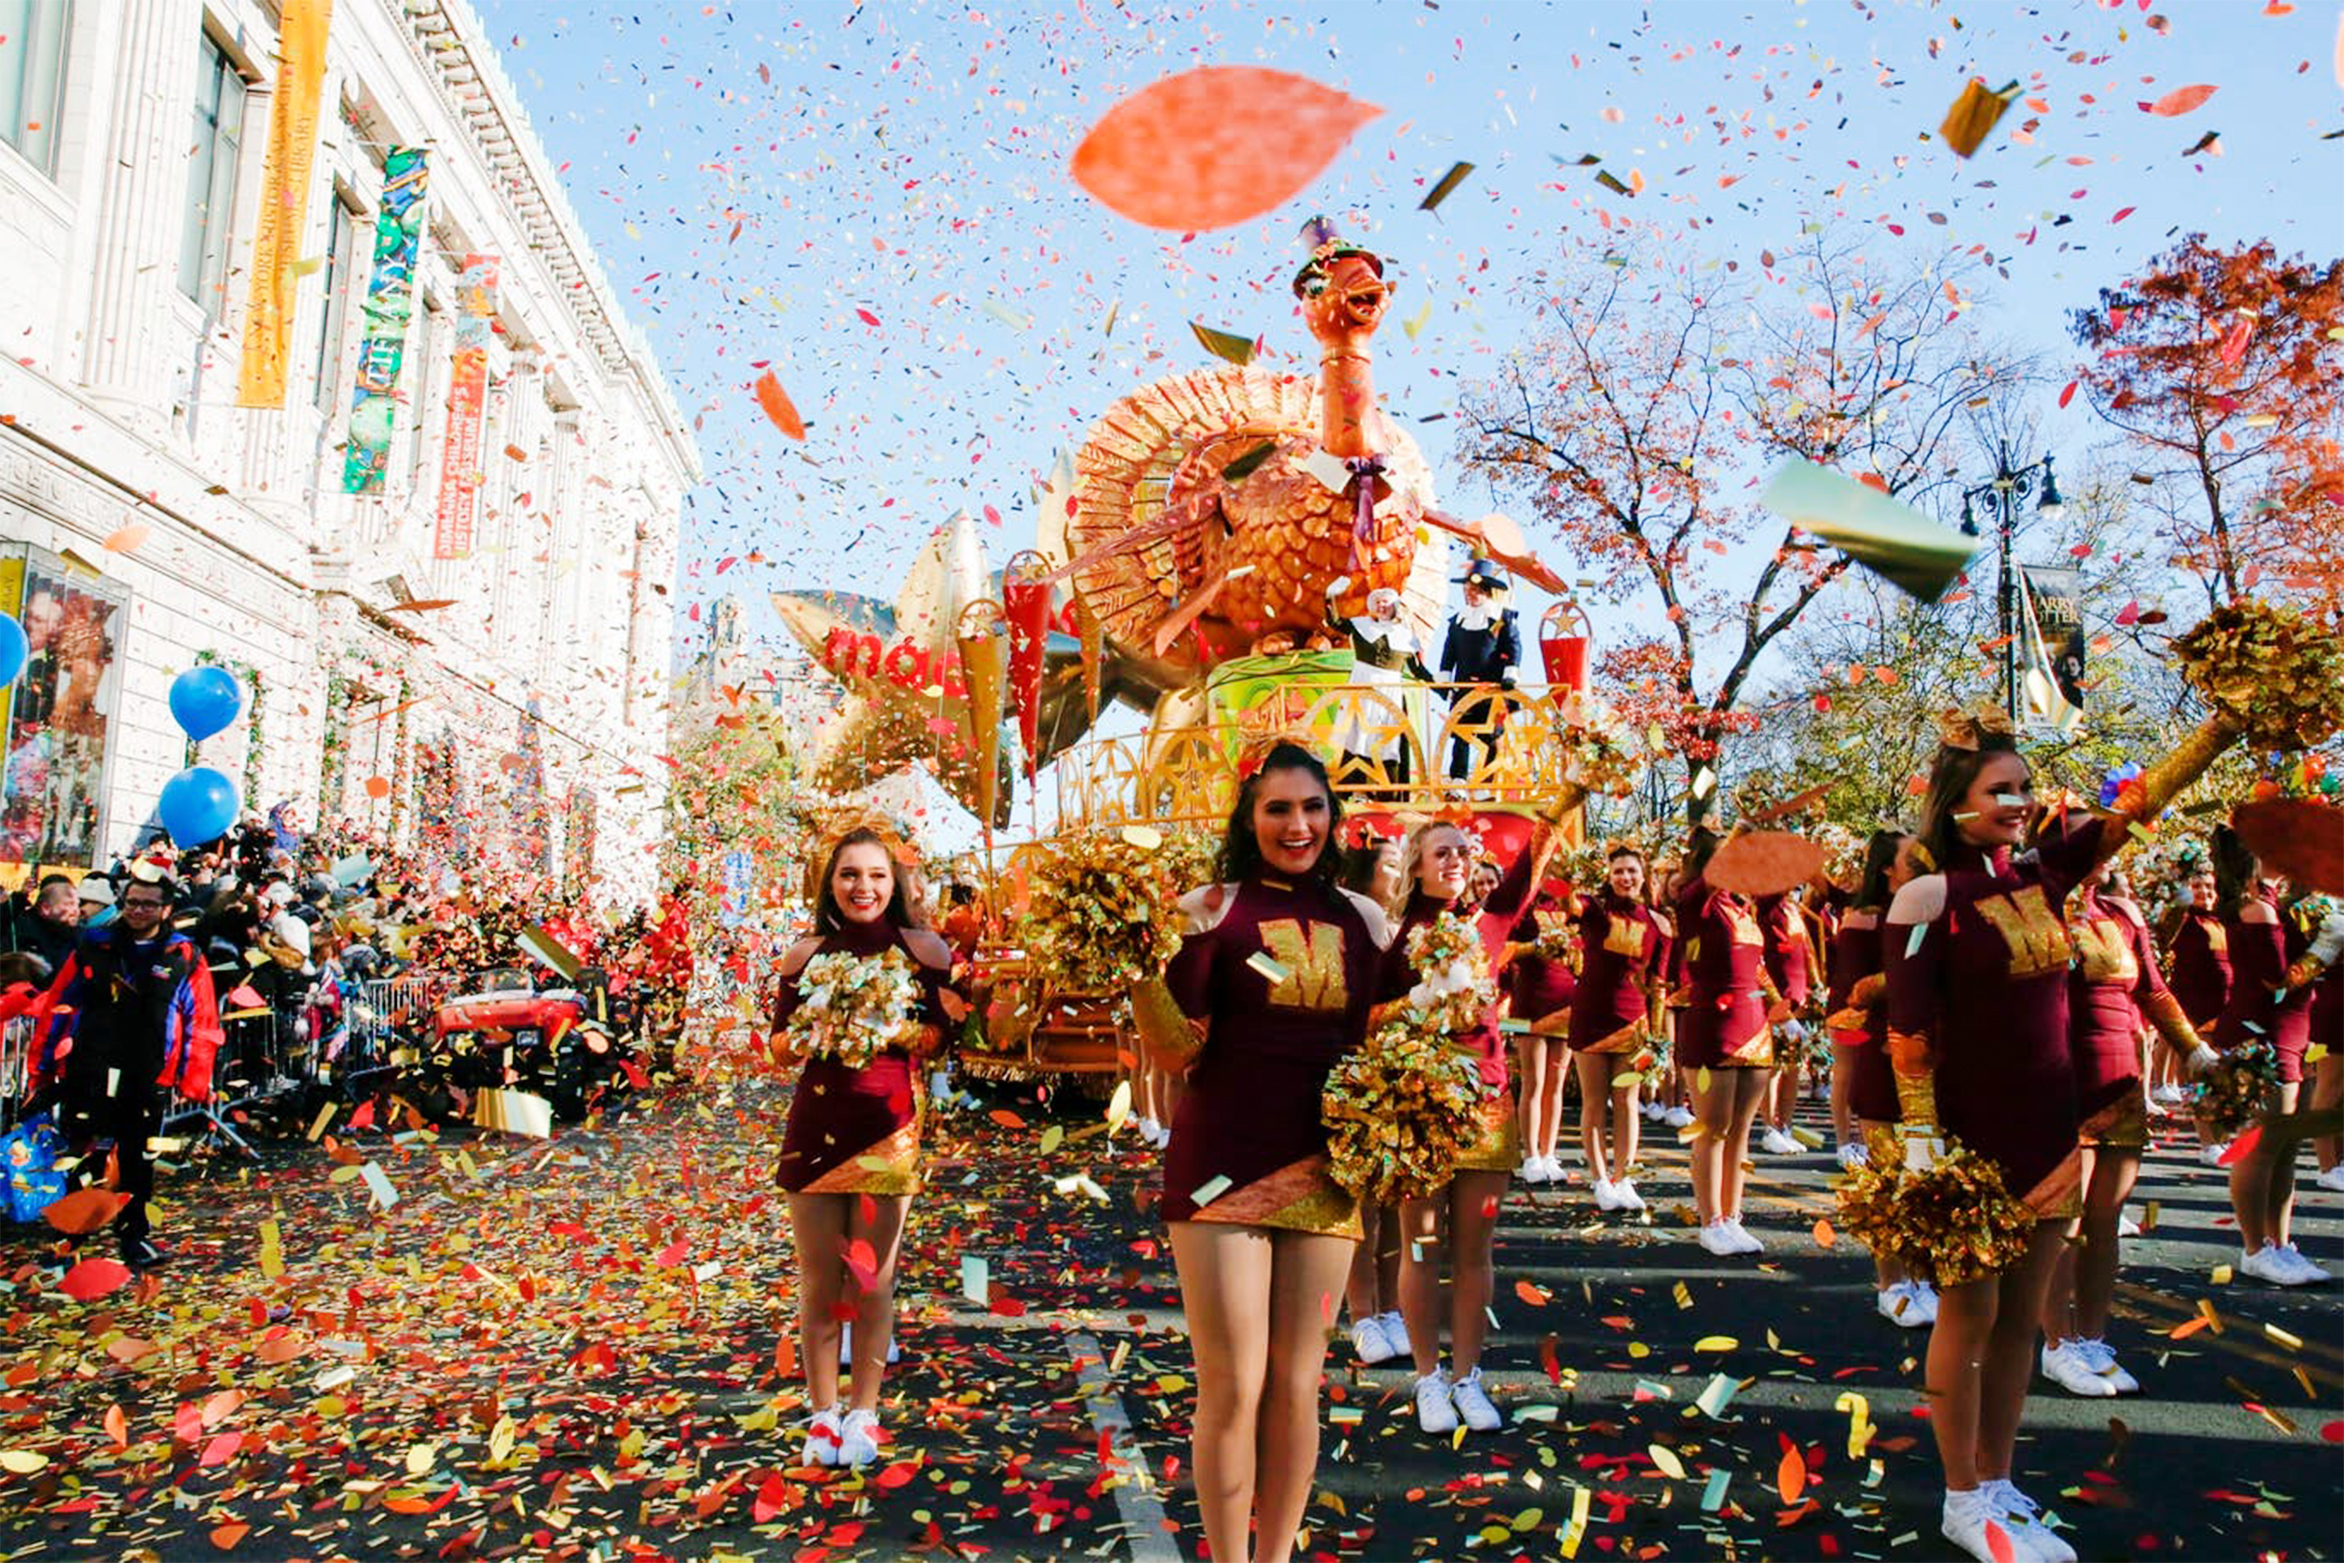 parade1-1.jpg